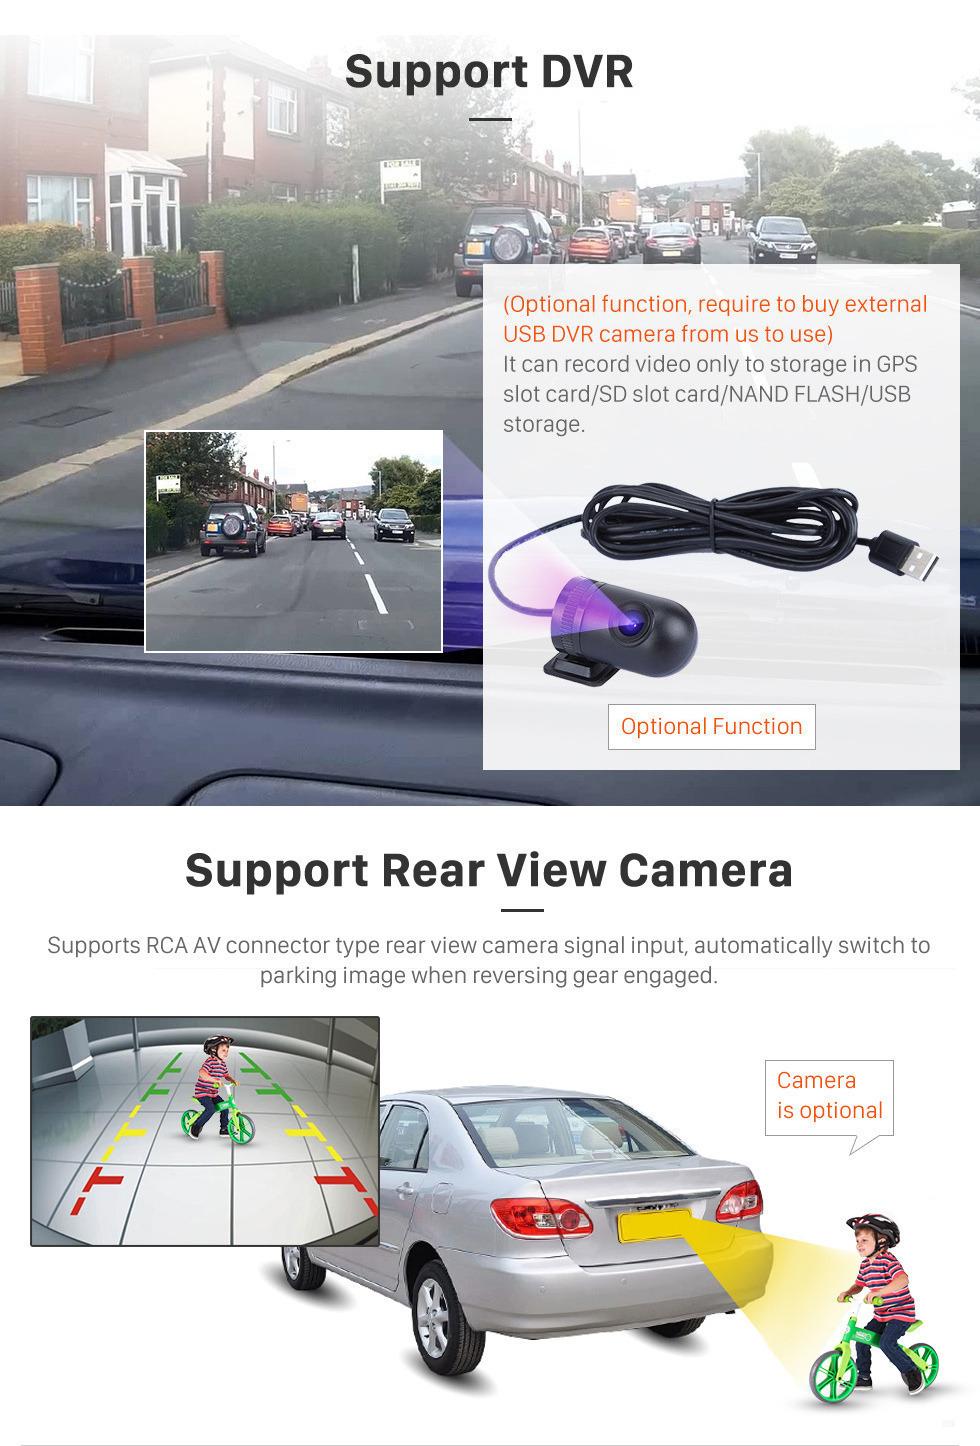 Seicane 9 Inch 2012 2013 2014 2015 VW Volkswagen Passat Android 9.0 HD Touchscreen Radio JETTA Support TPMS DVR OBD II Rear camera AUX 3G WiFi HD 1080P Video